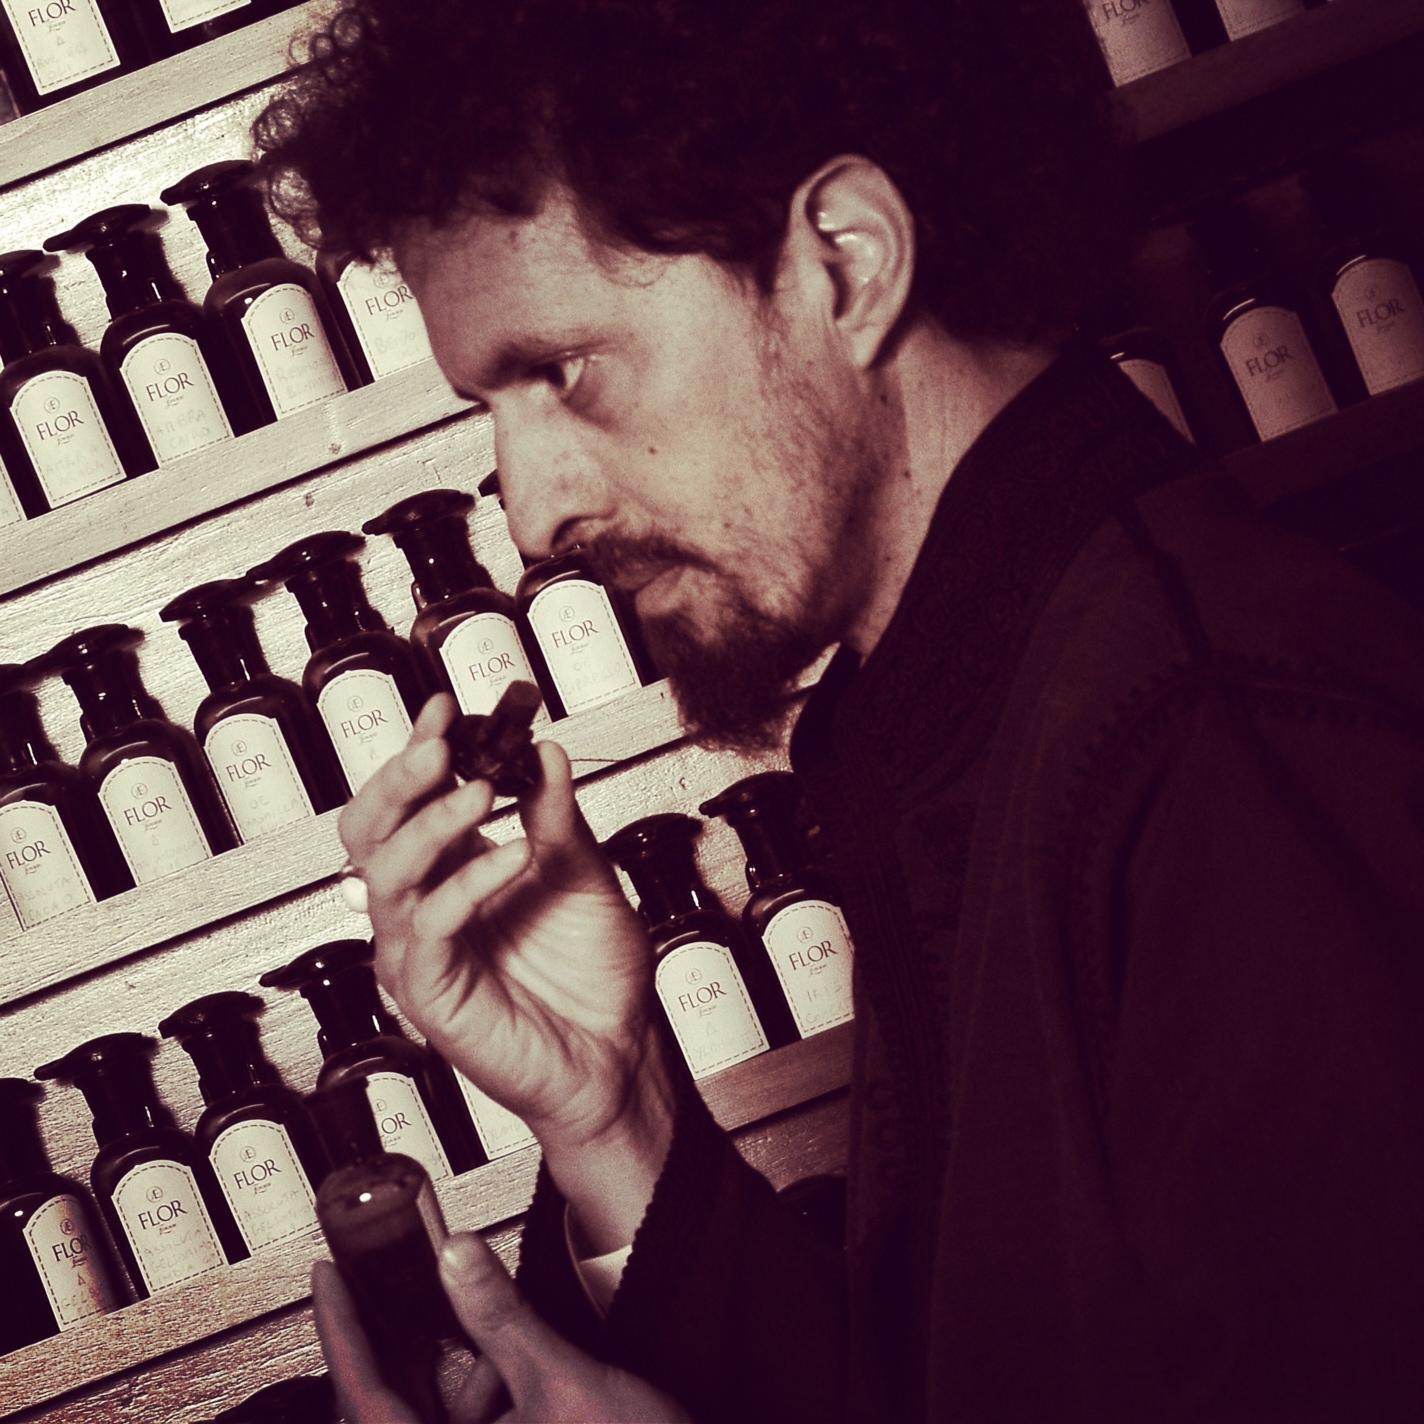 INTERVIEW Sileno Cheloni, parfumeur Aqua Flor Firenze